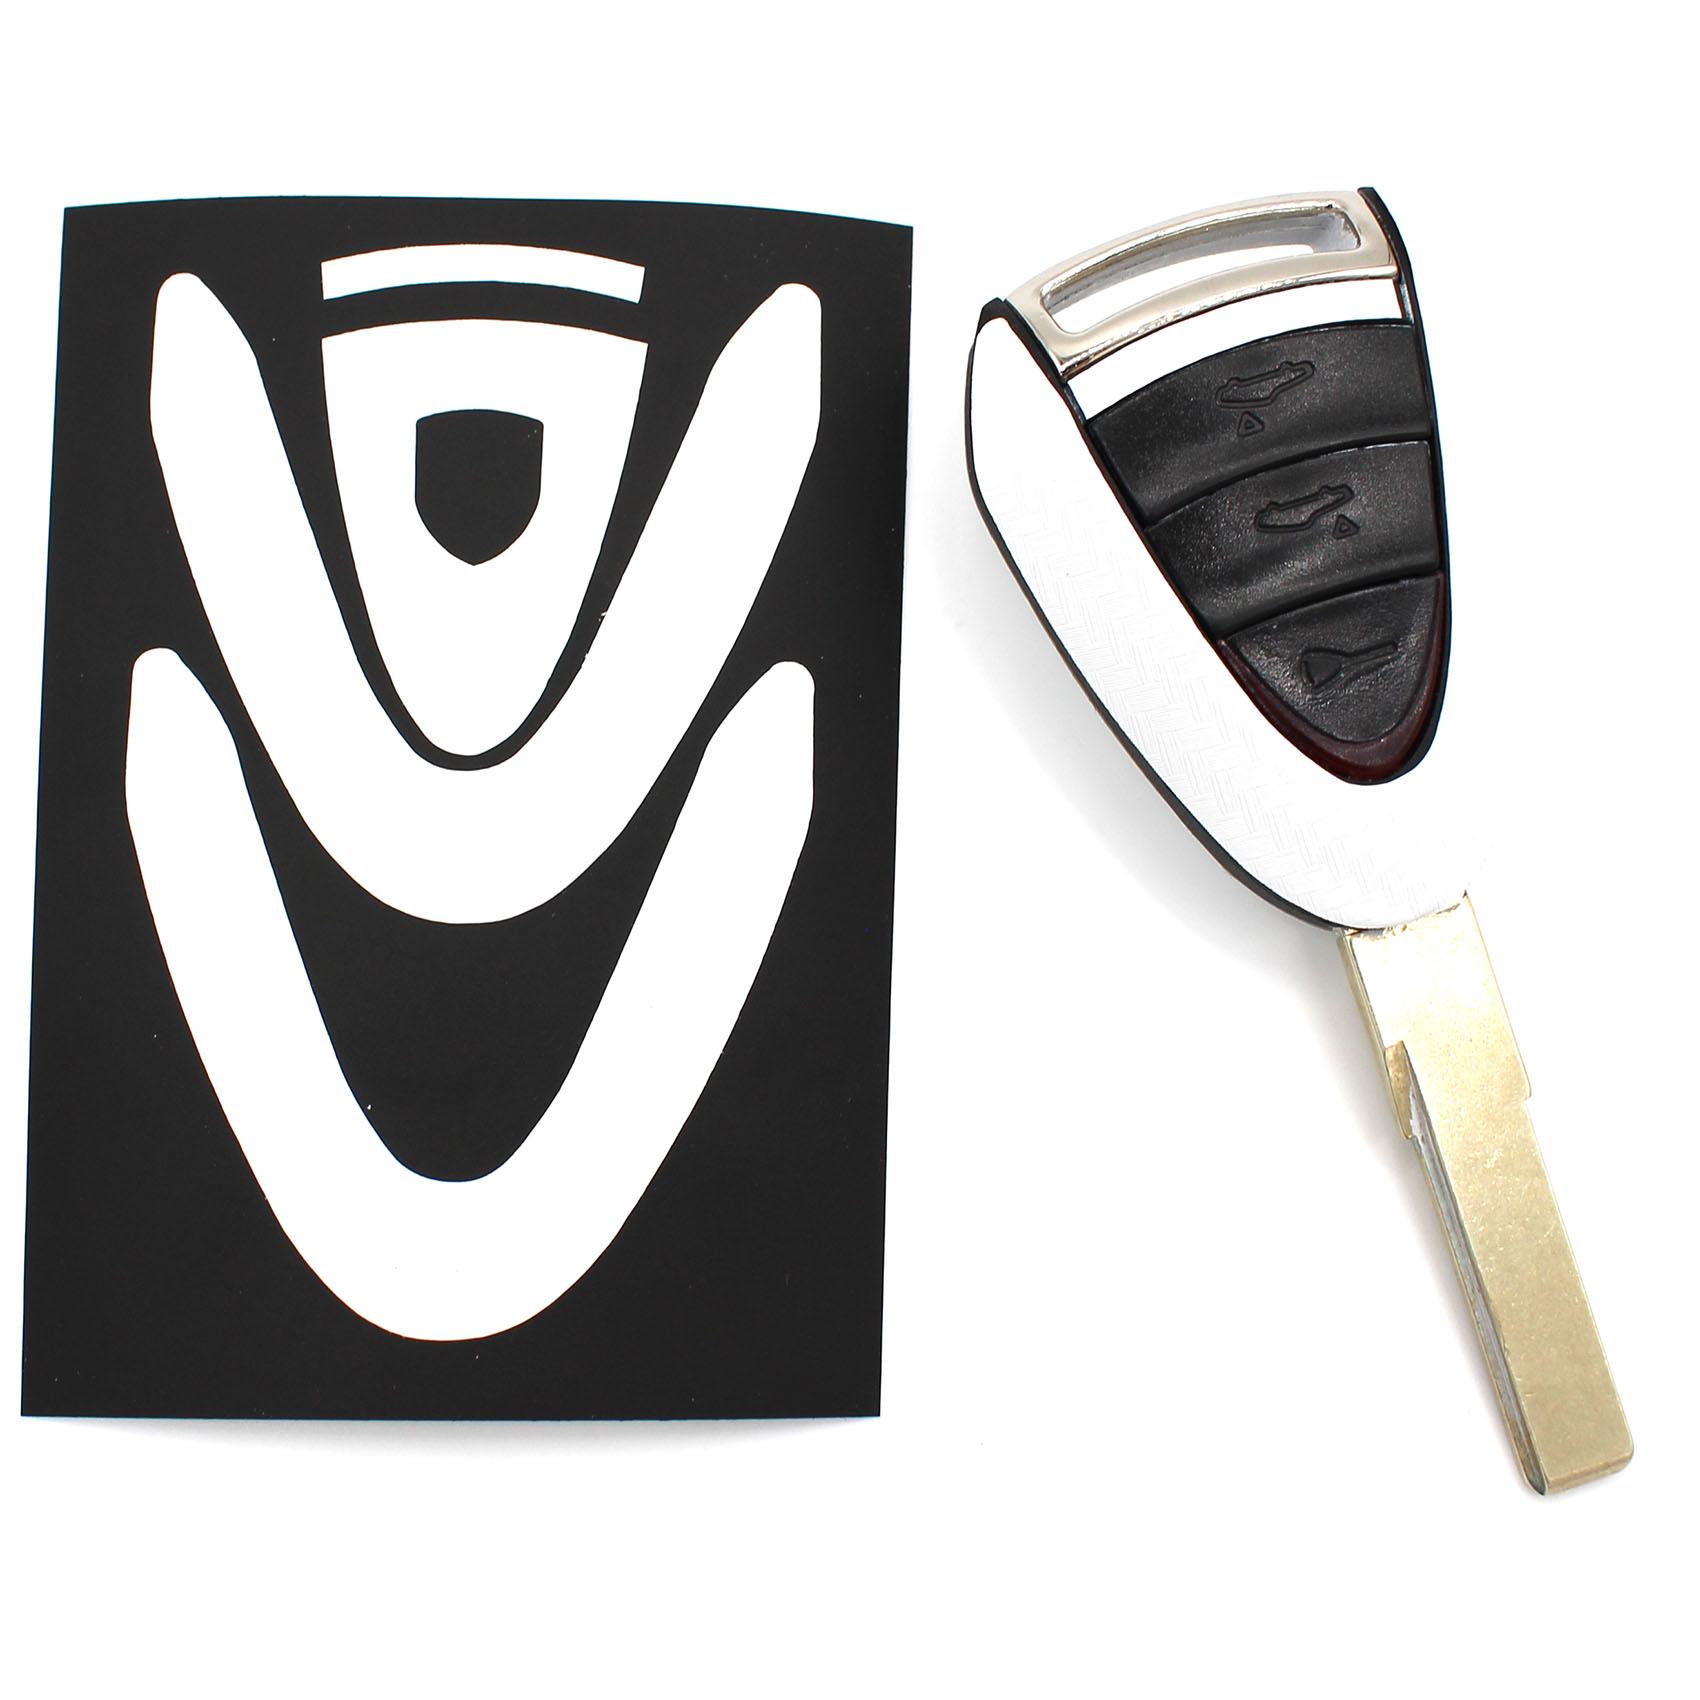 carbon wei folie schl ssel porsche b 911 h lle folie. Black Bedroom Furniture Sets. Home Design Ideas